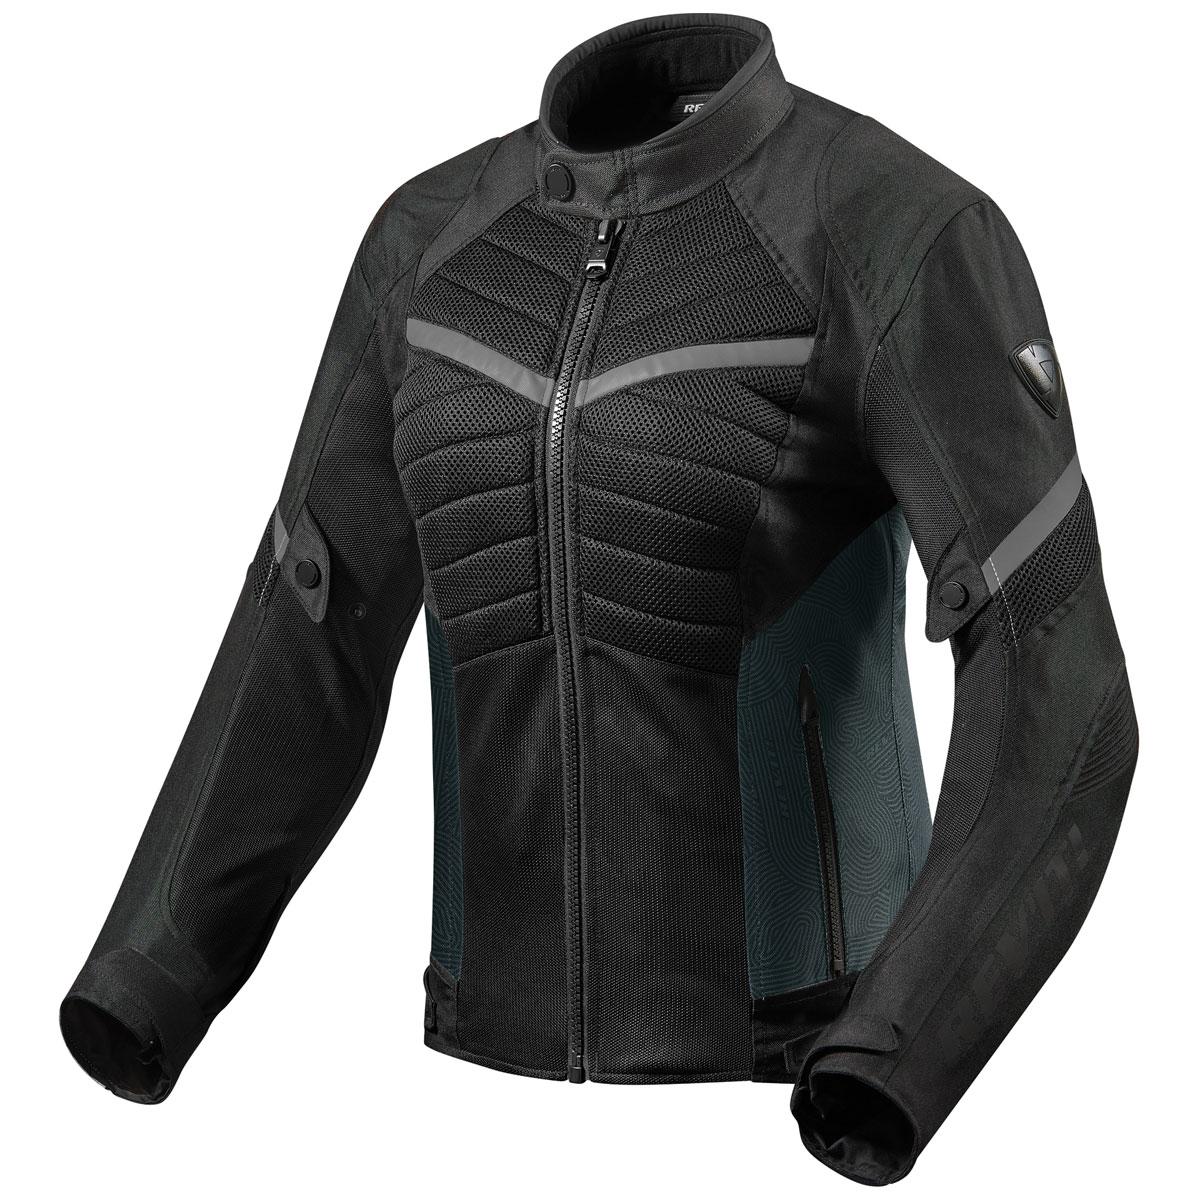 REV′IT! Women's Arc Air Black/Gray Textile Jacket